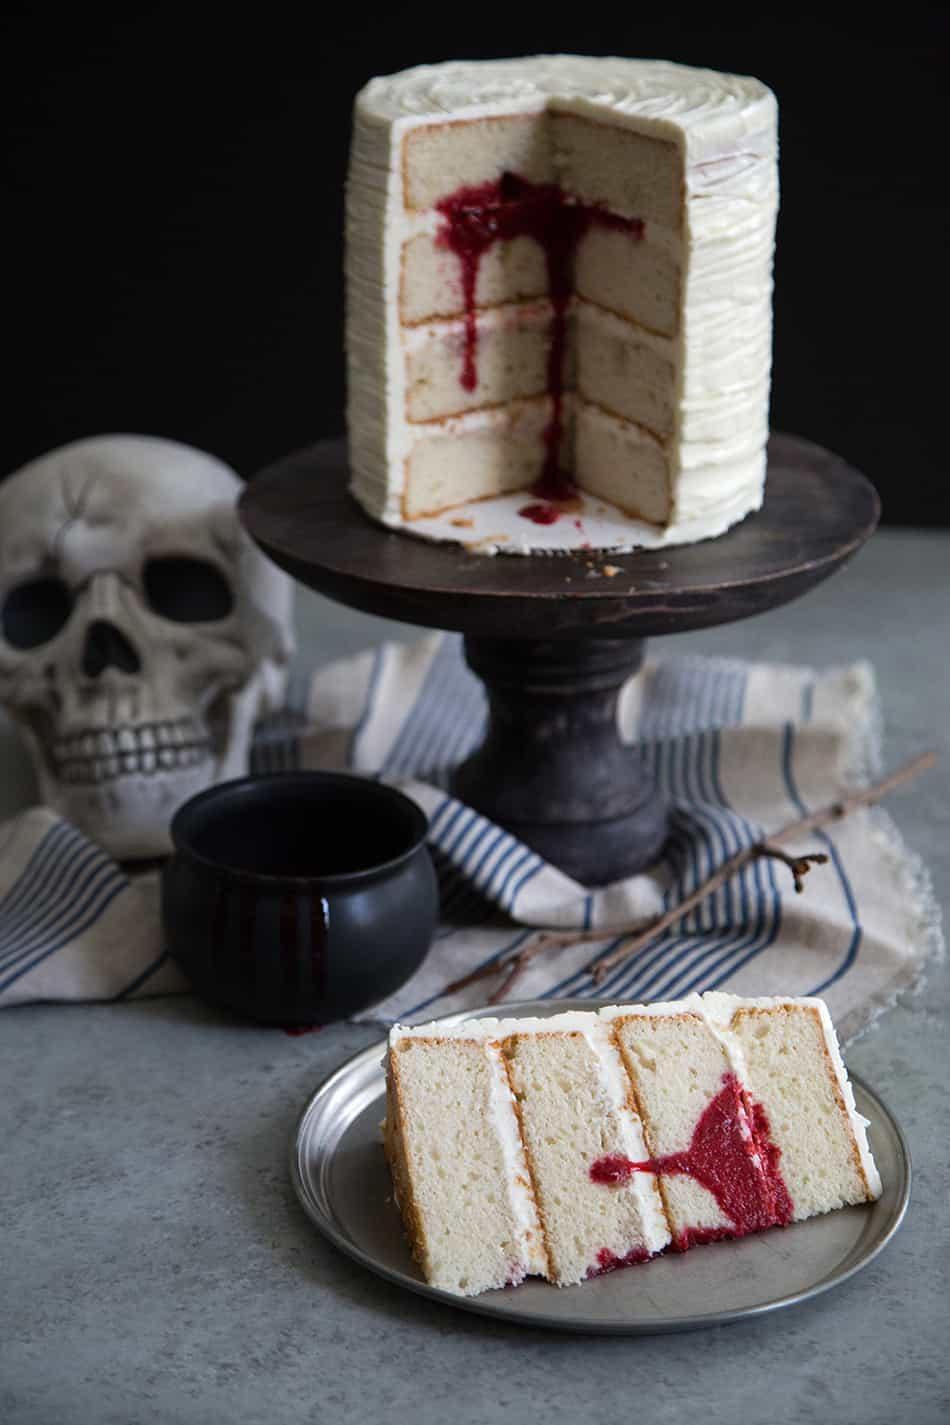 Surprise Bloody Cake Vanilla Cake Wtih Raspberry The